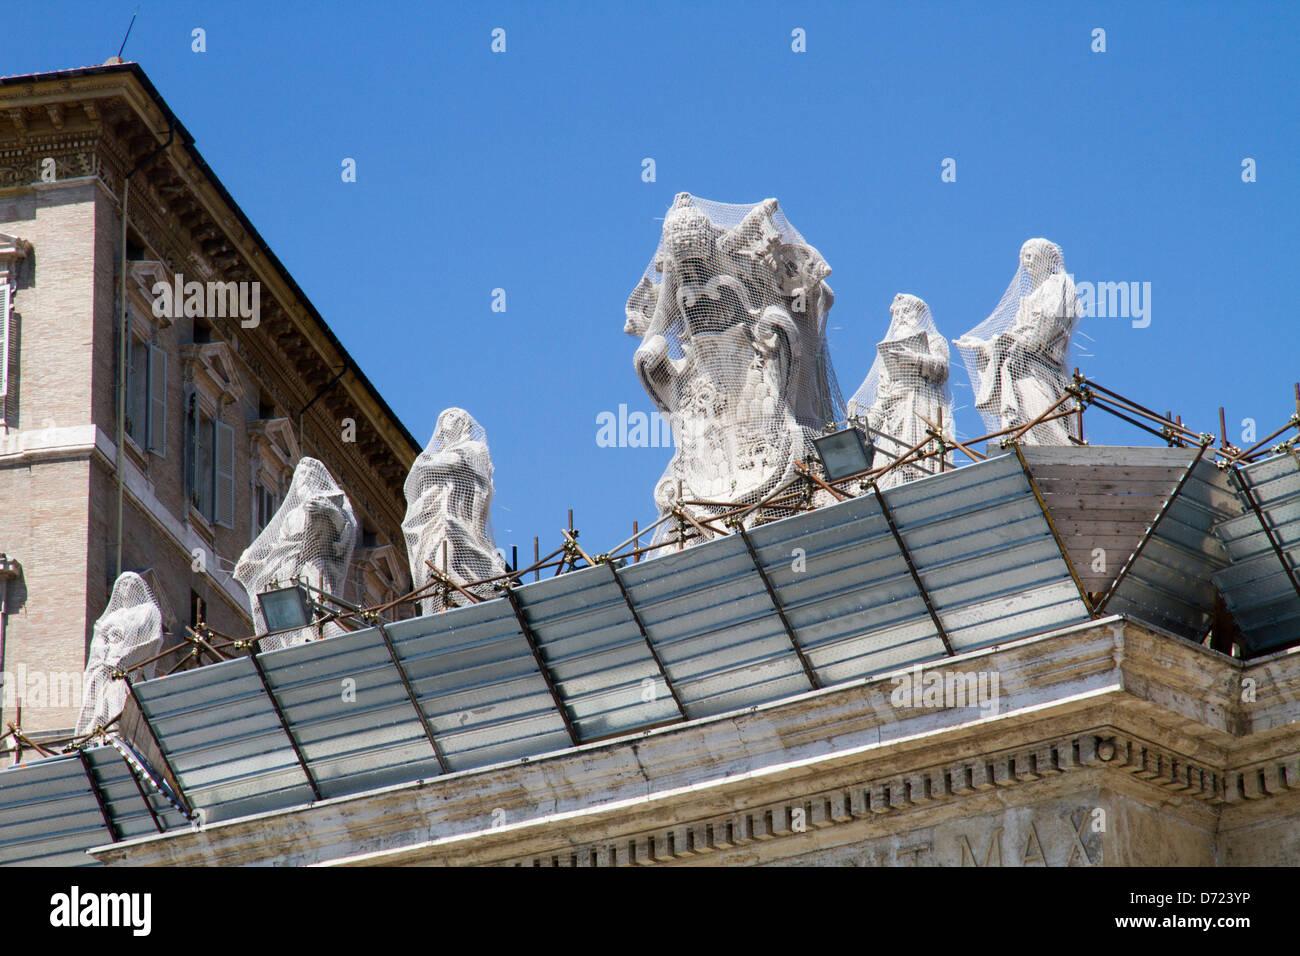 Sant Peter vatican restoring statues - Stock Image